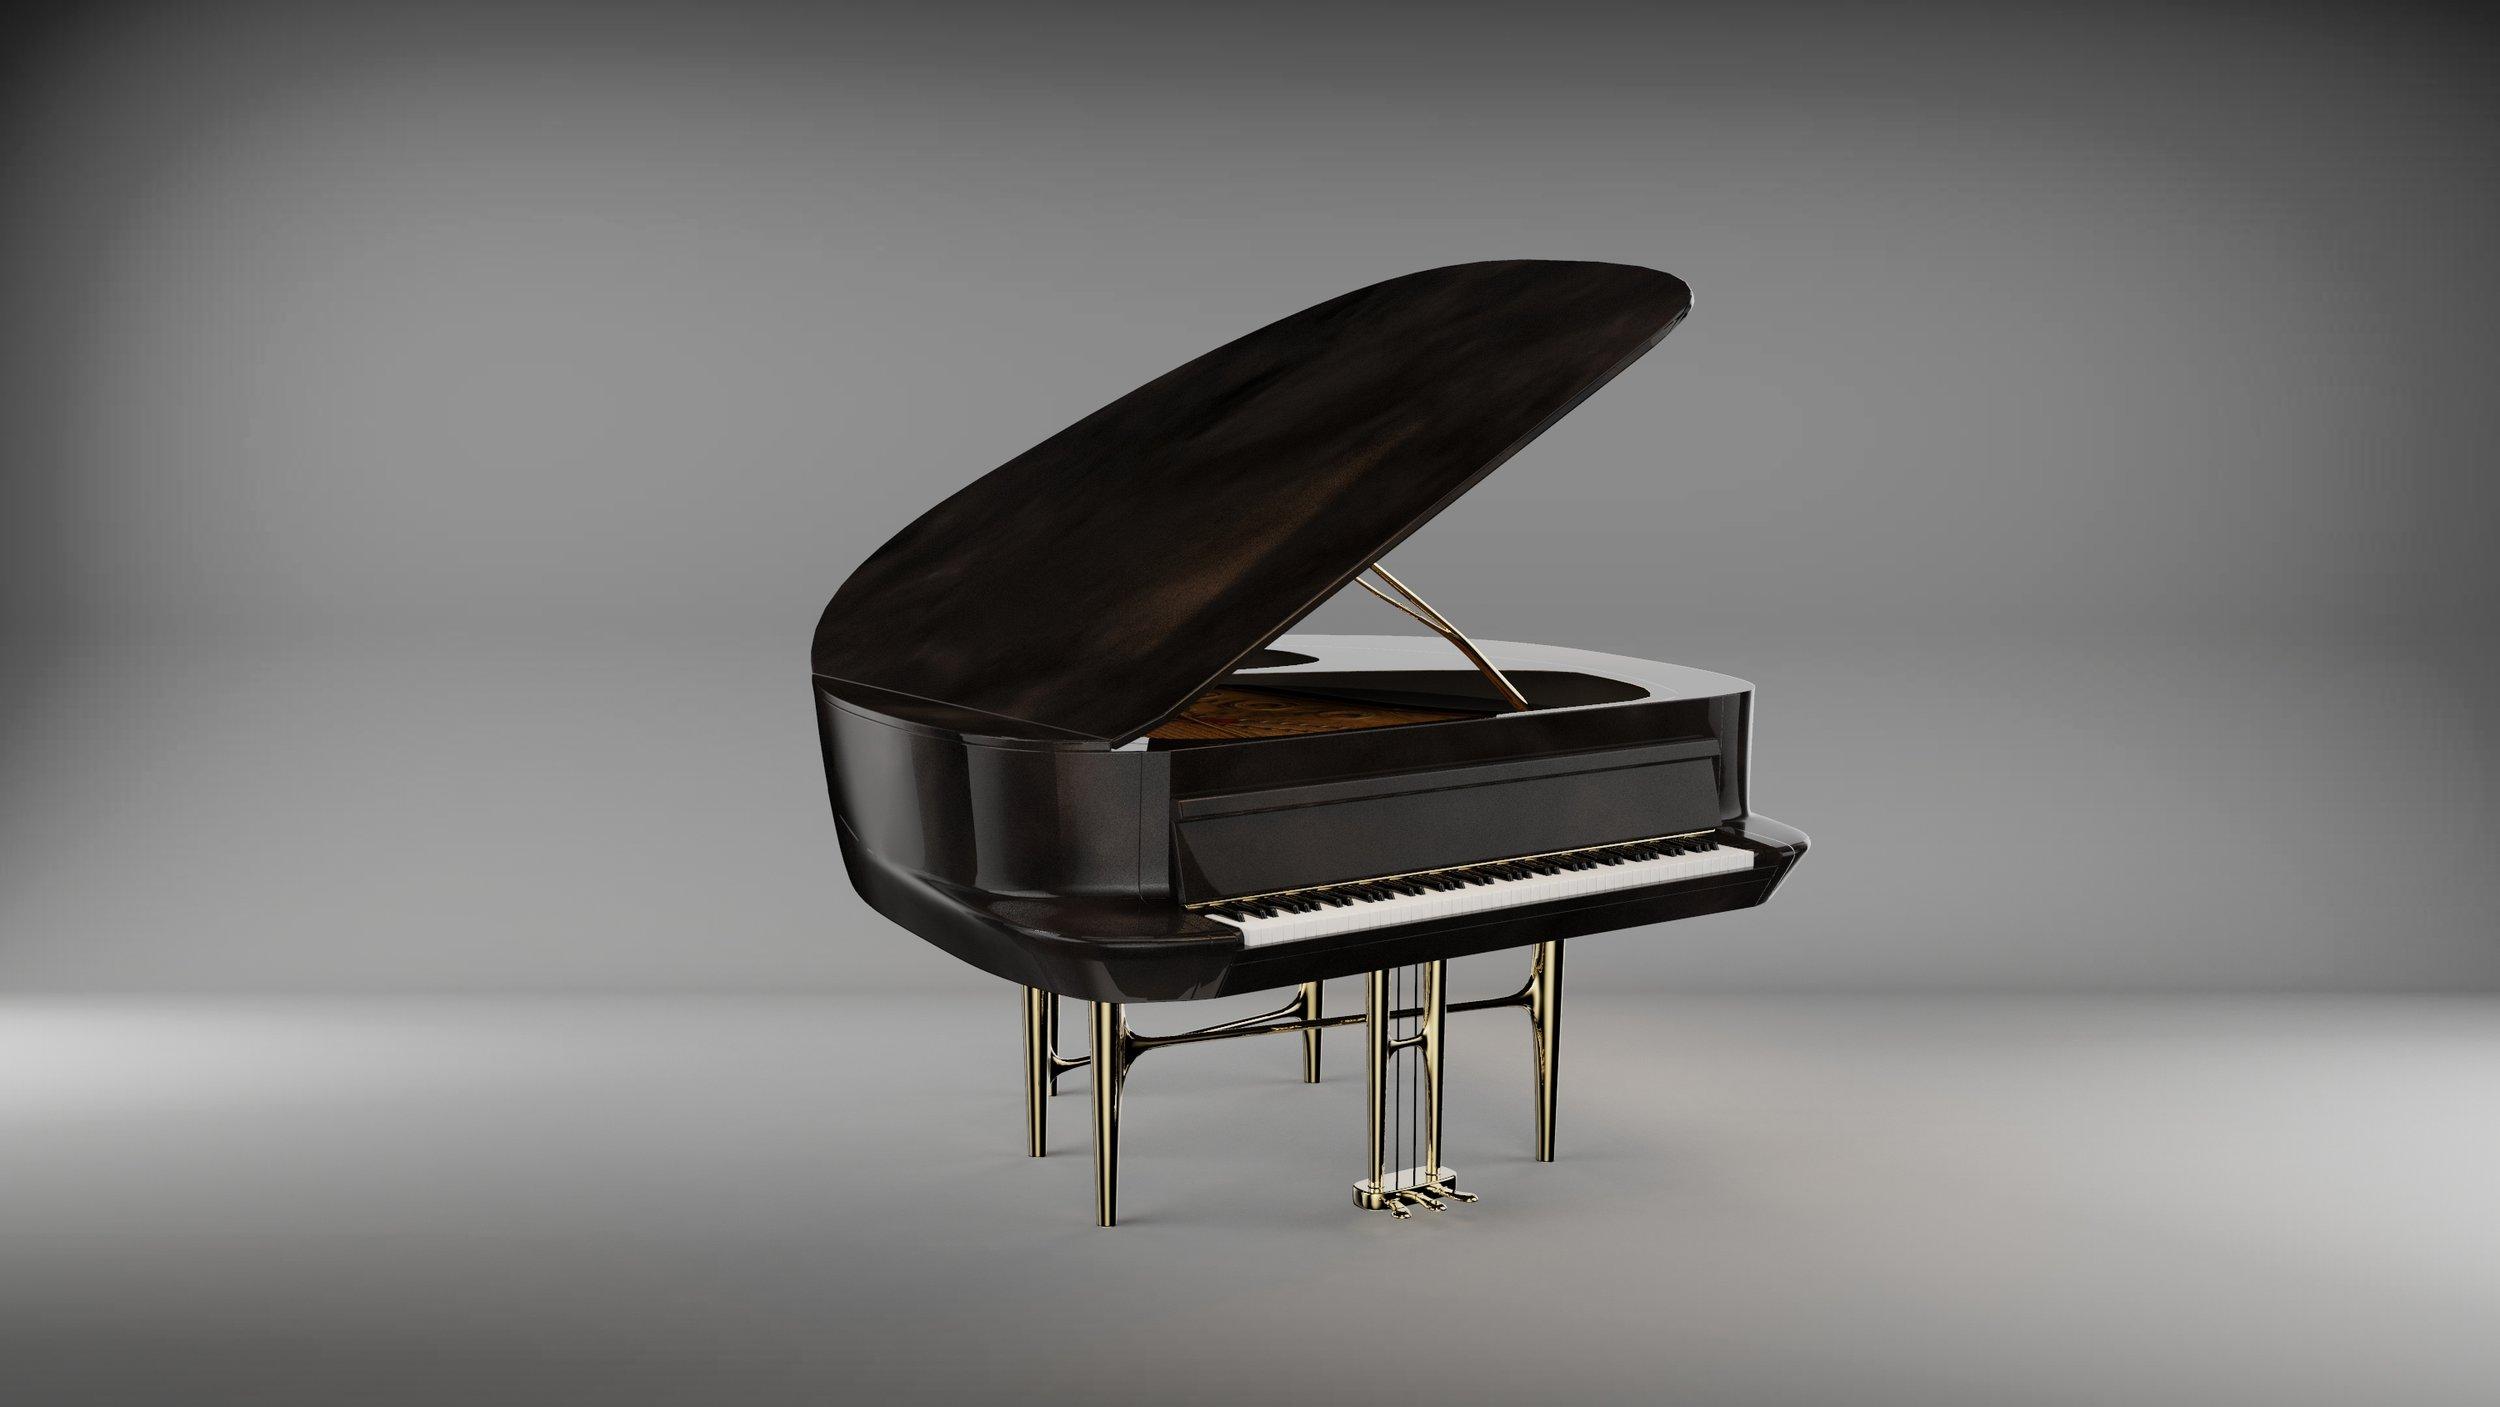 190522_BU_Una_piano_render.2033.jpg